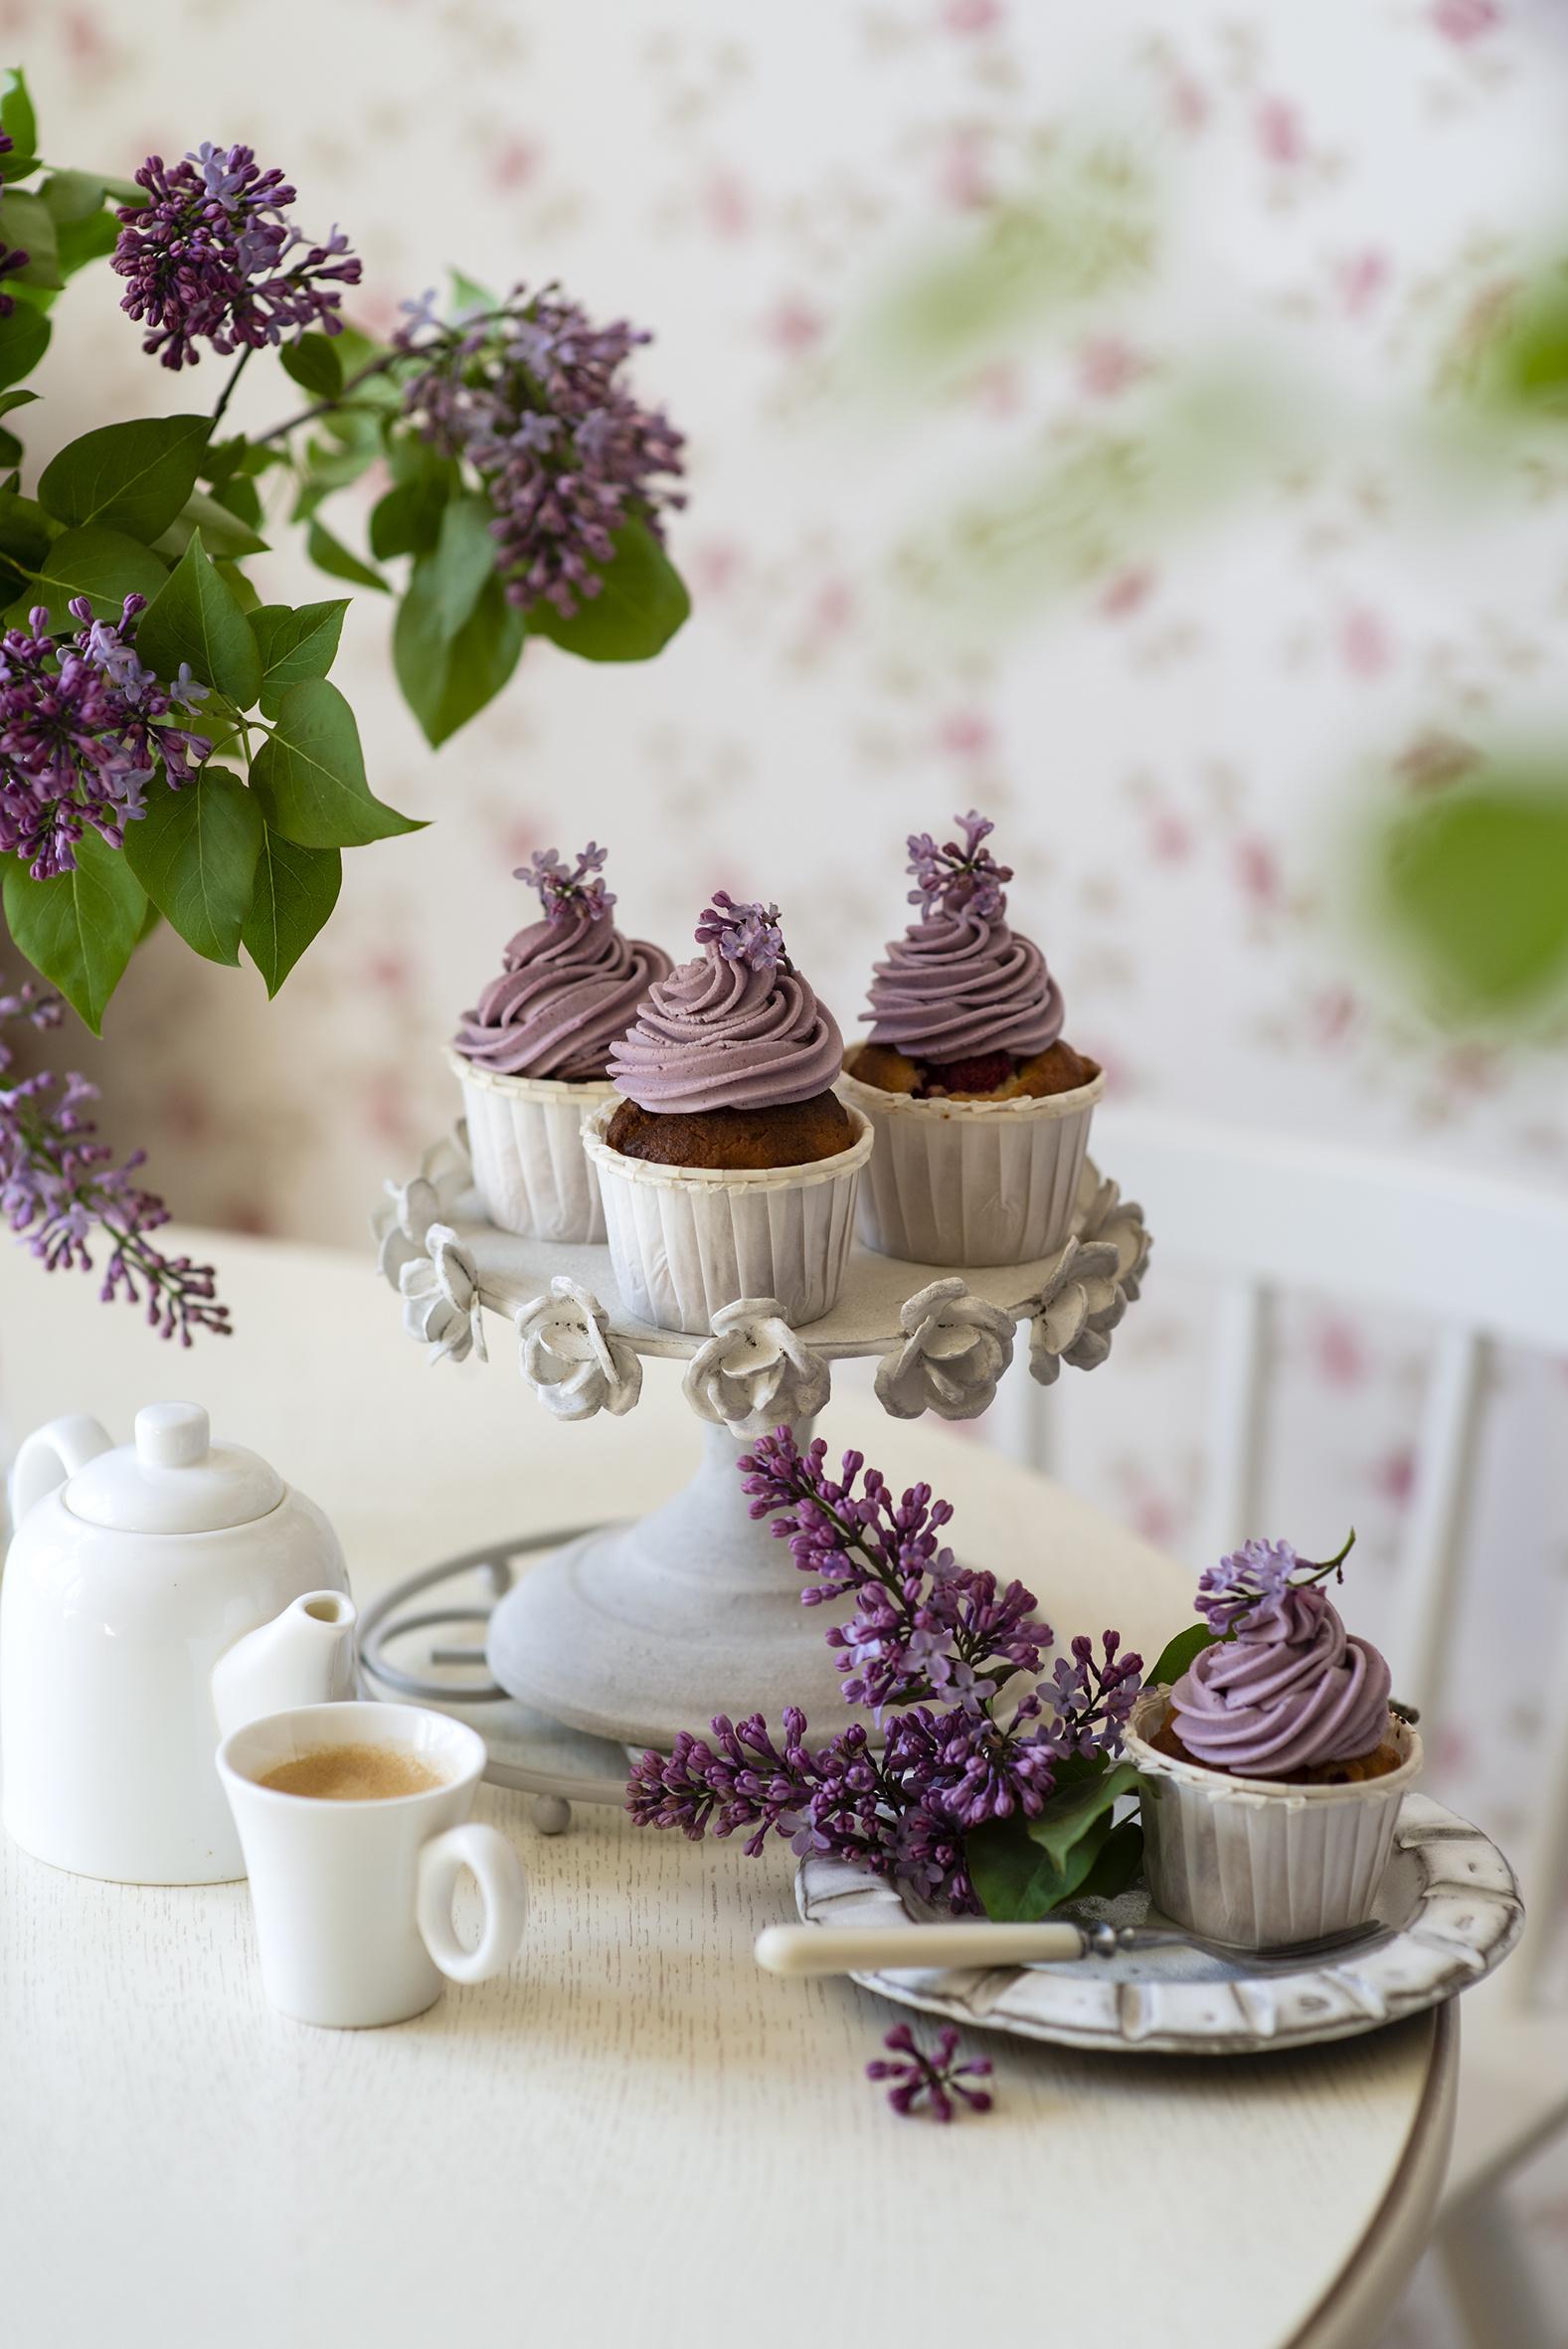 Foton Kaffe Cupcake Cappuccino Blommor bondsyren Mat Grenar Tekopp Stilleben  till Mobilen blomma syringa Syrensläktet